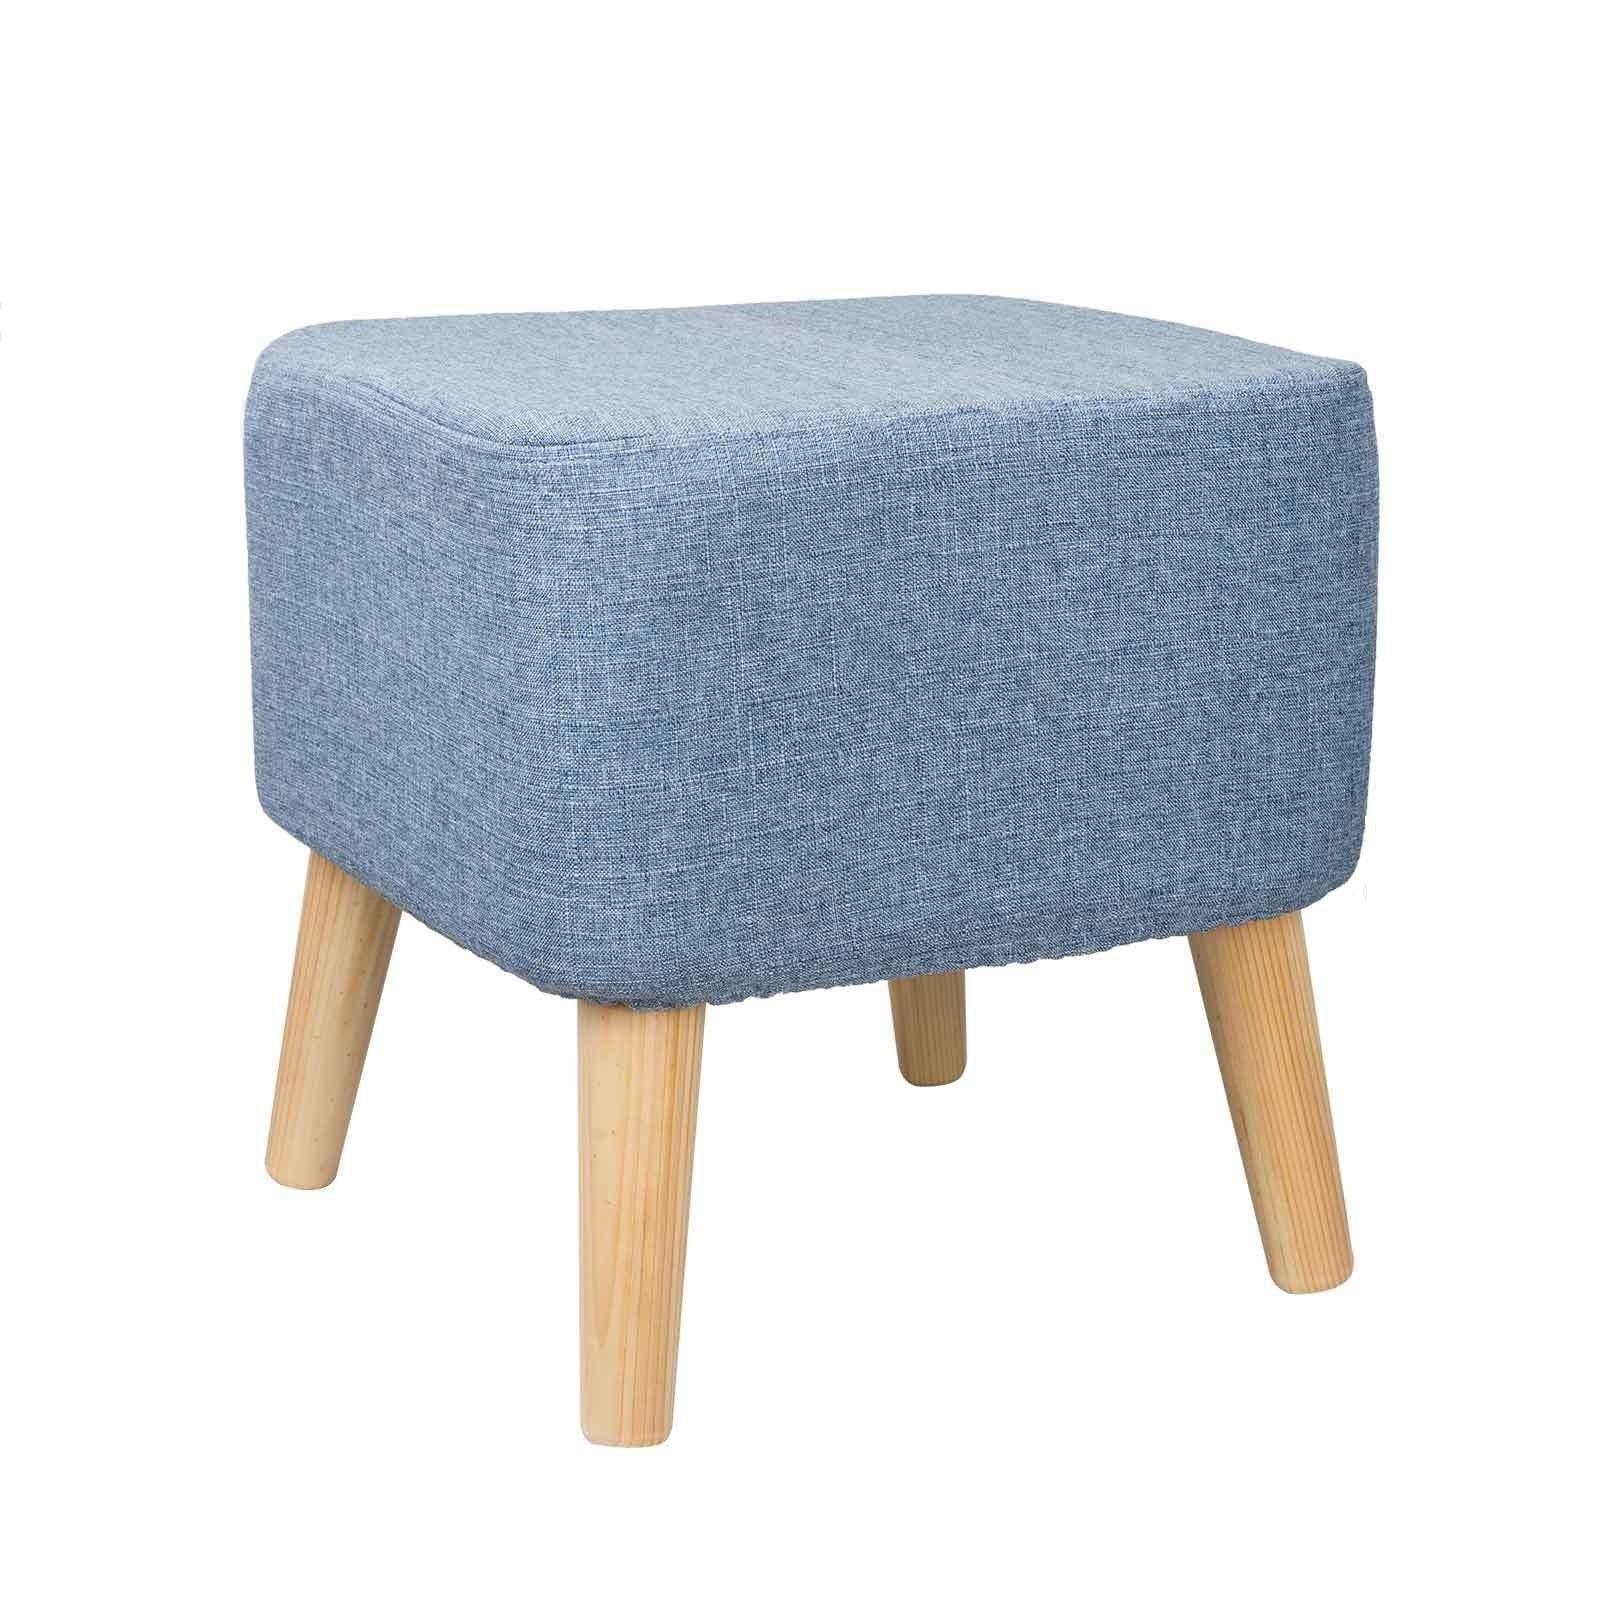 Modern Coloured Upholstered Footstool Ottoman Pouffe Stool